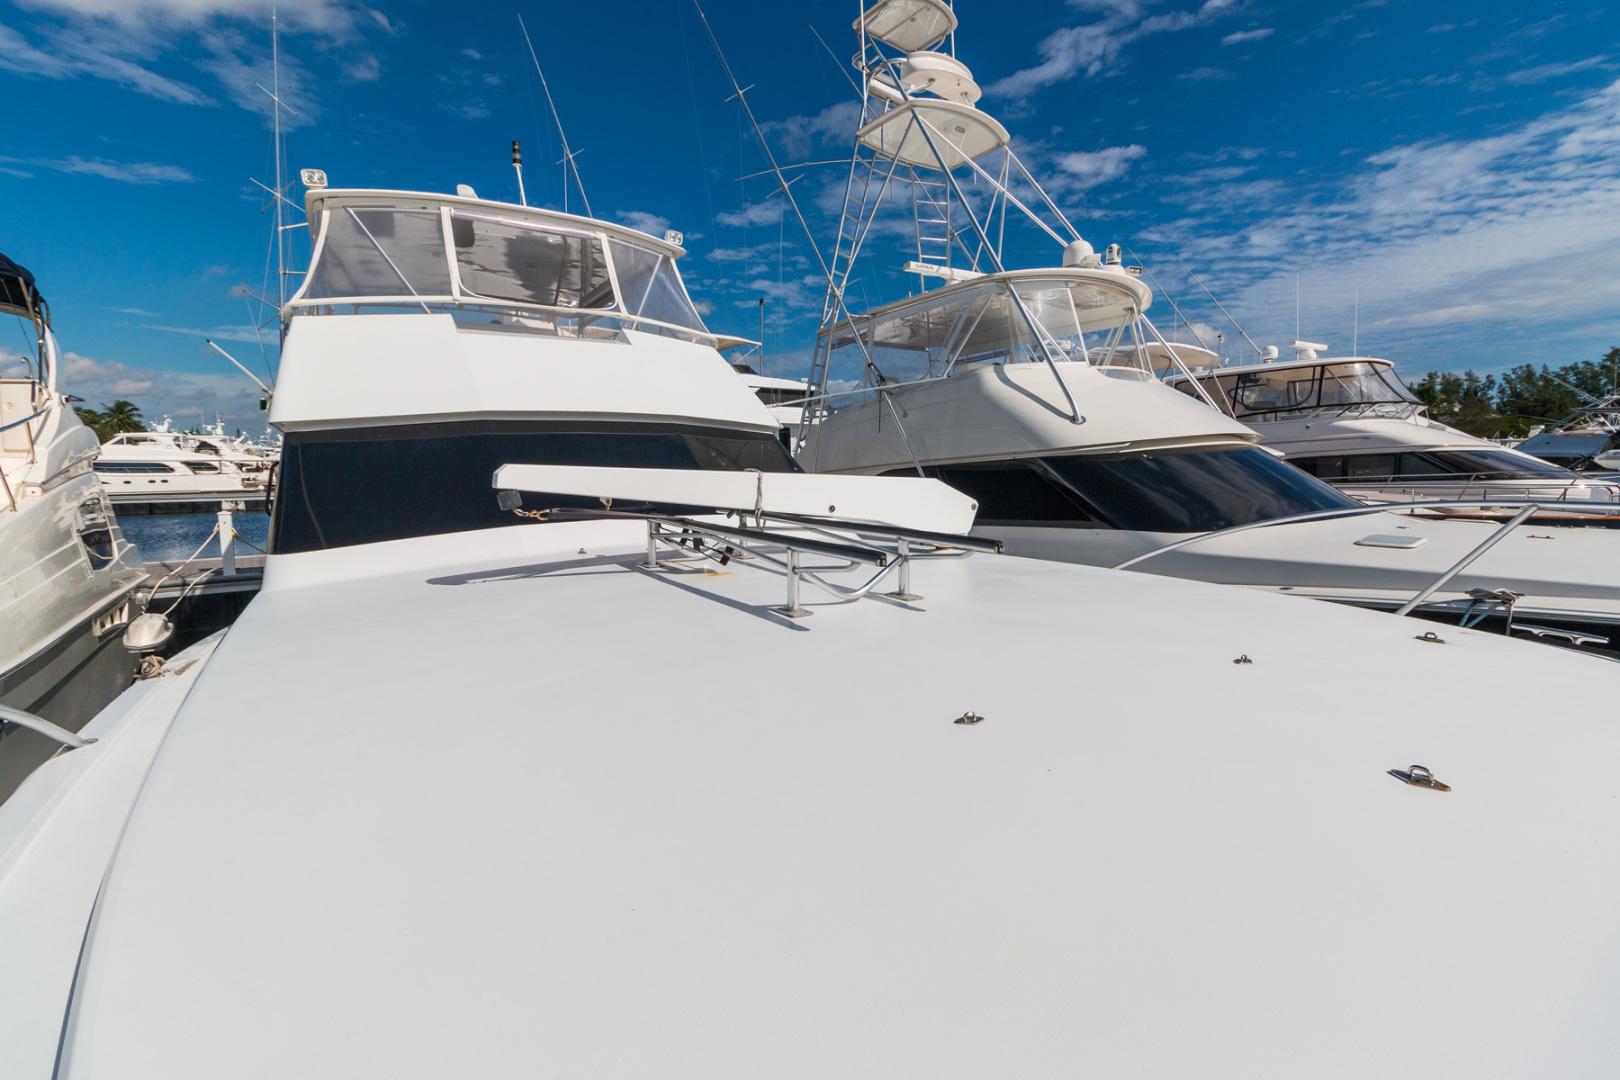 Viking-Convertible 2000-Knotty Girl Fort Lauderdale-Florida-United States-1564774   Thumbnail